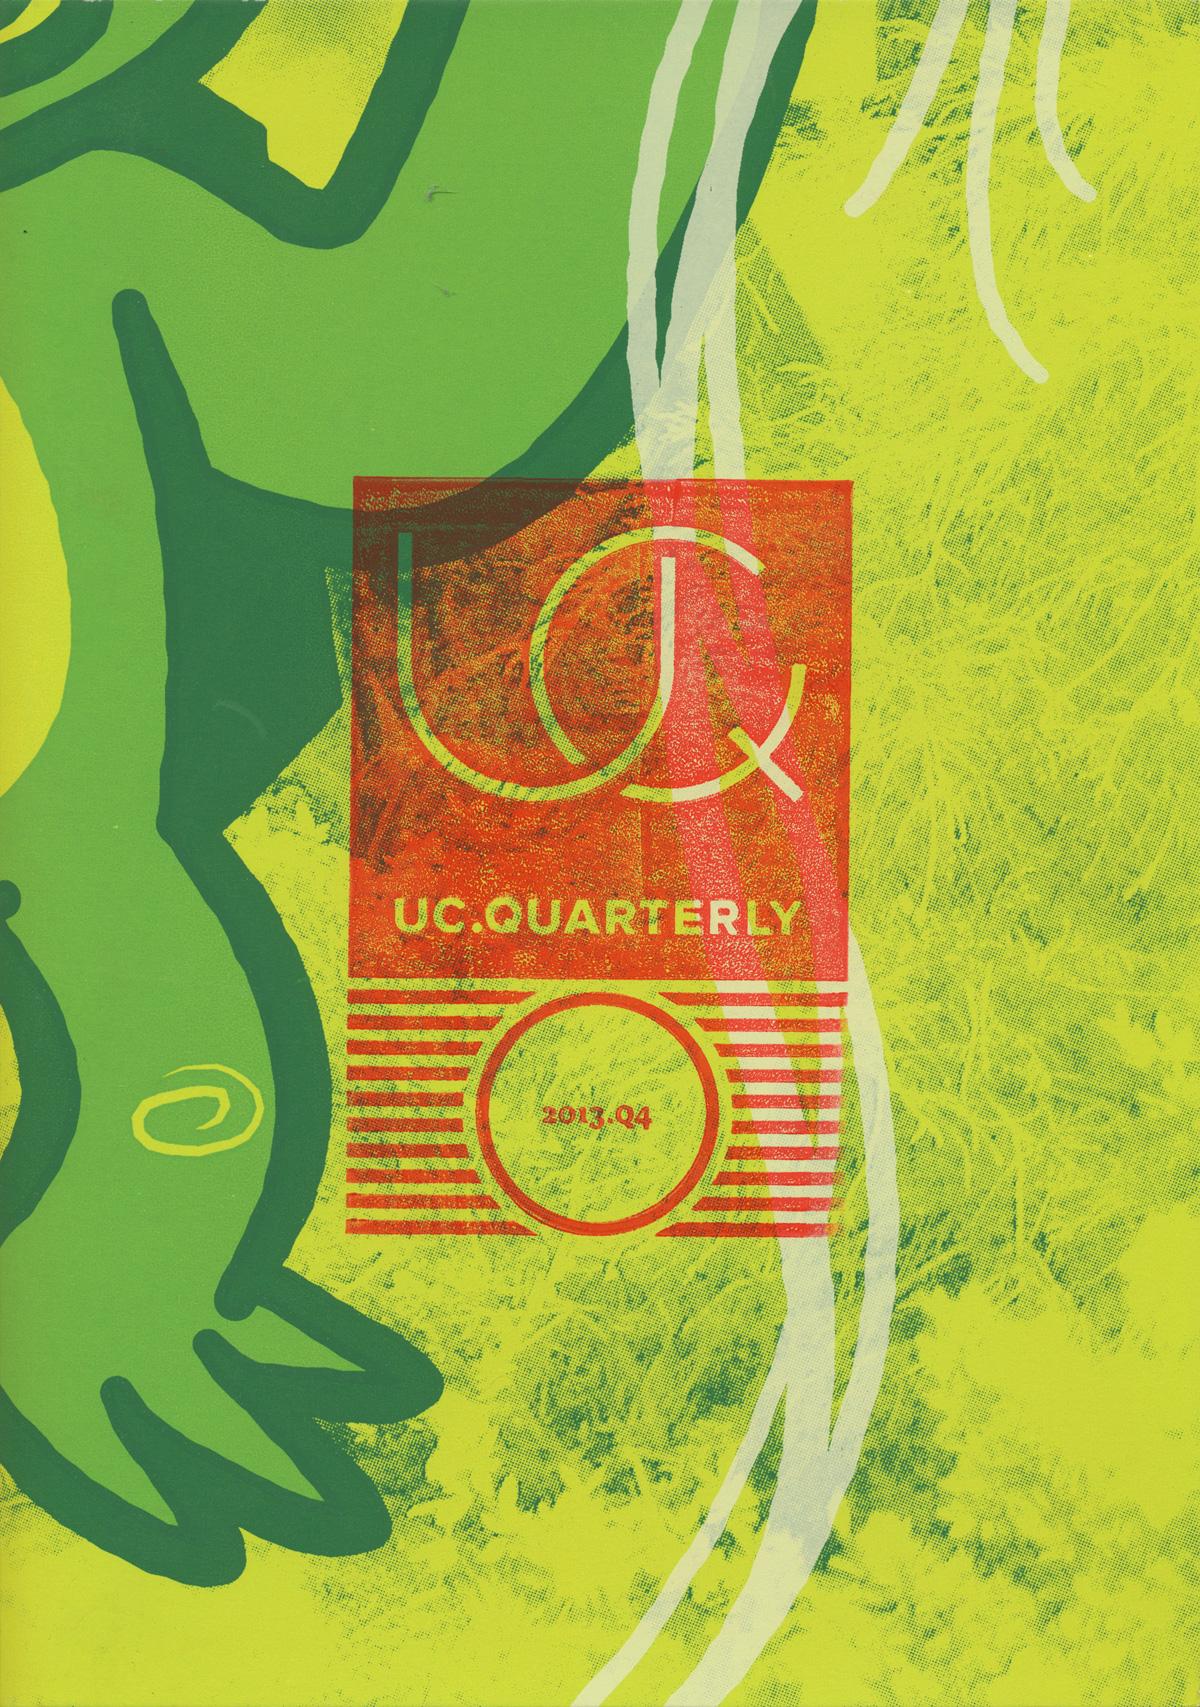 UC.Quarterly